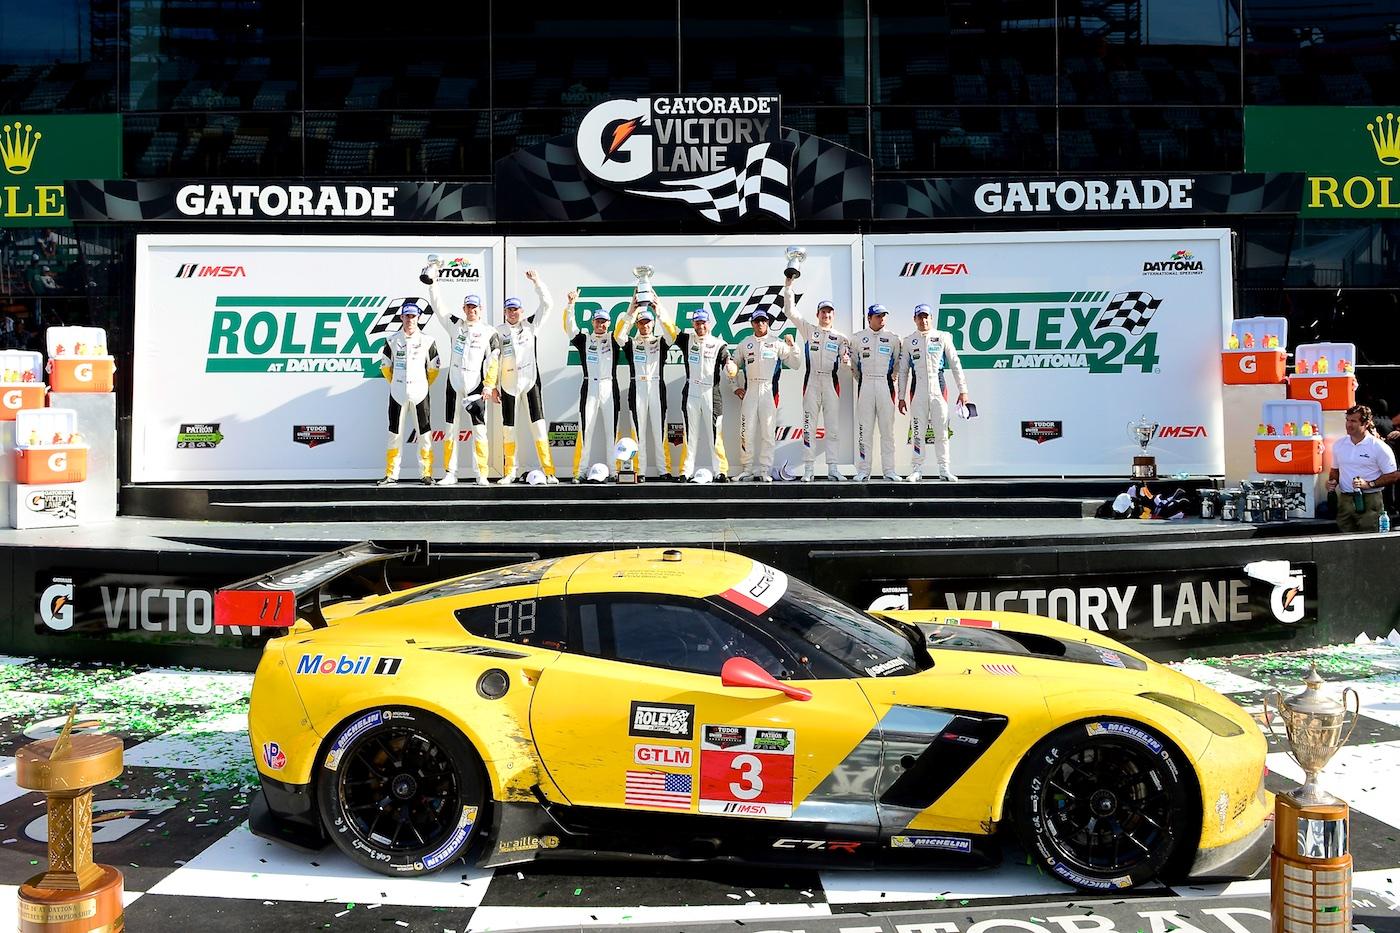 2015 24 hours daytona corvette podium win